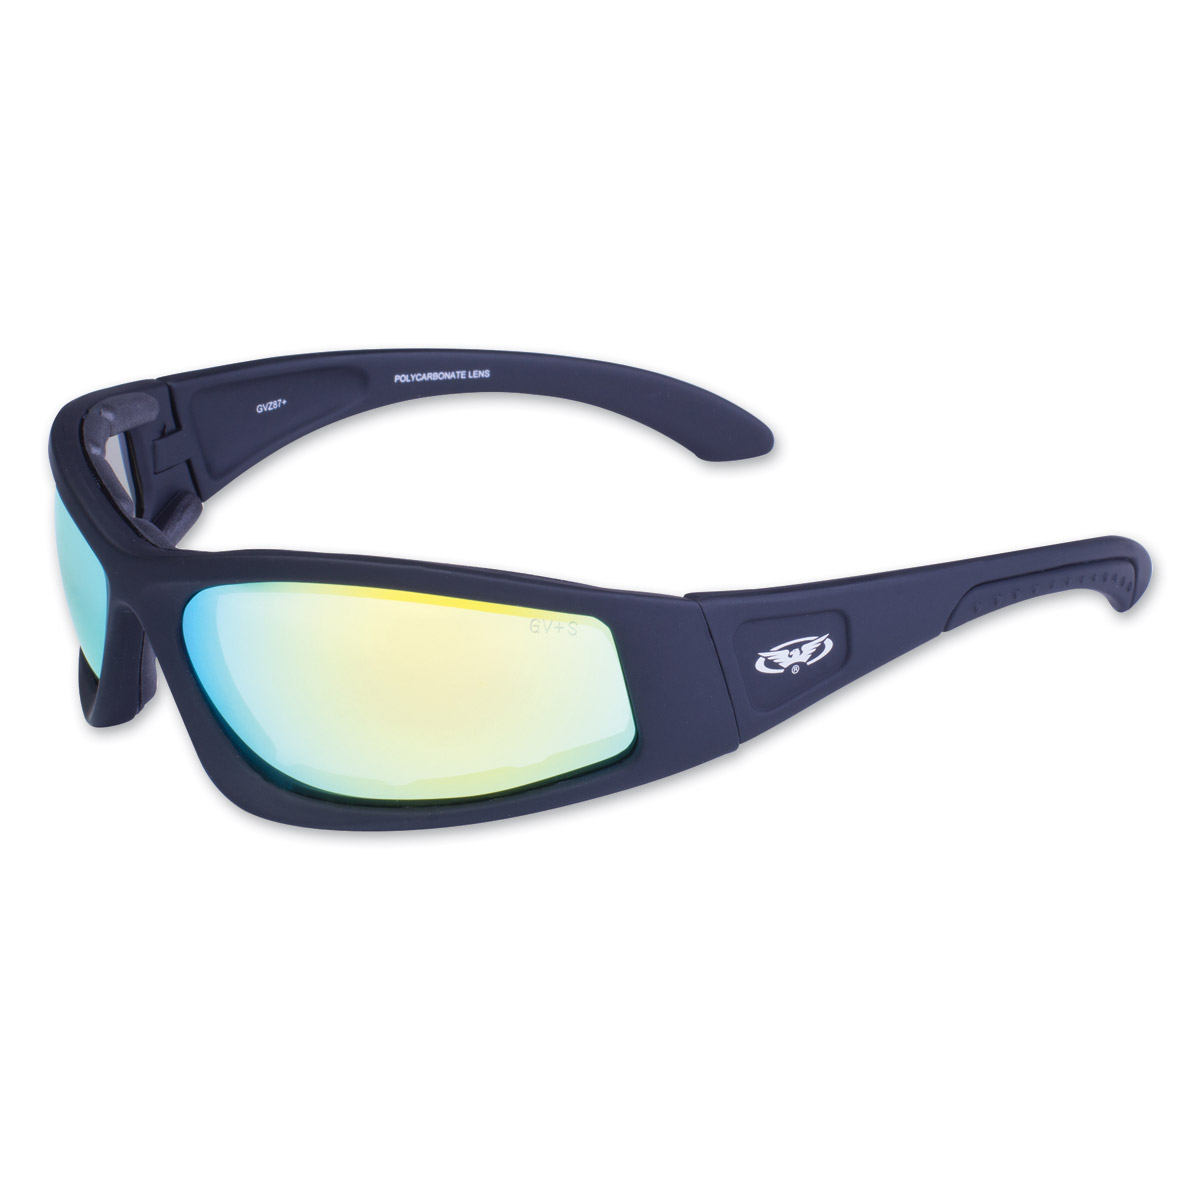 global vision eyewear triumphant g tech black sunglasses w